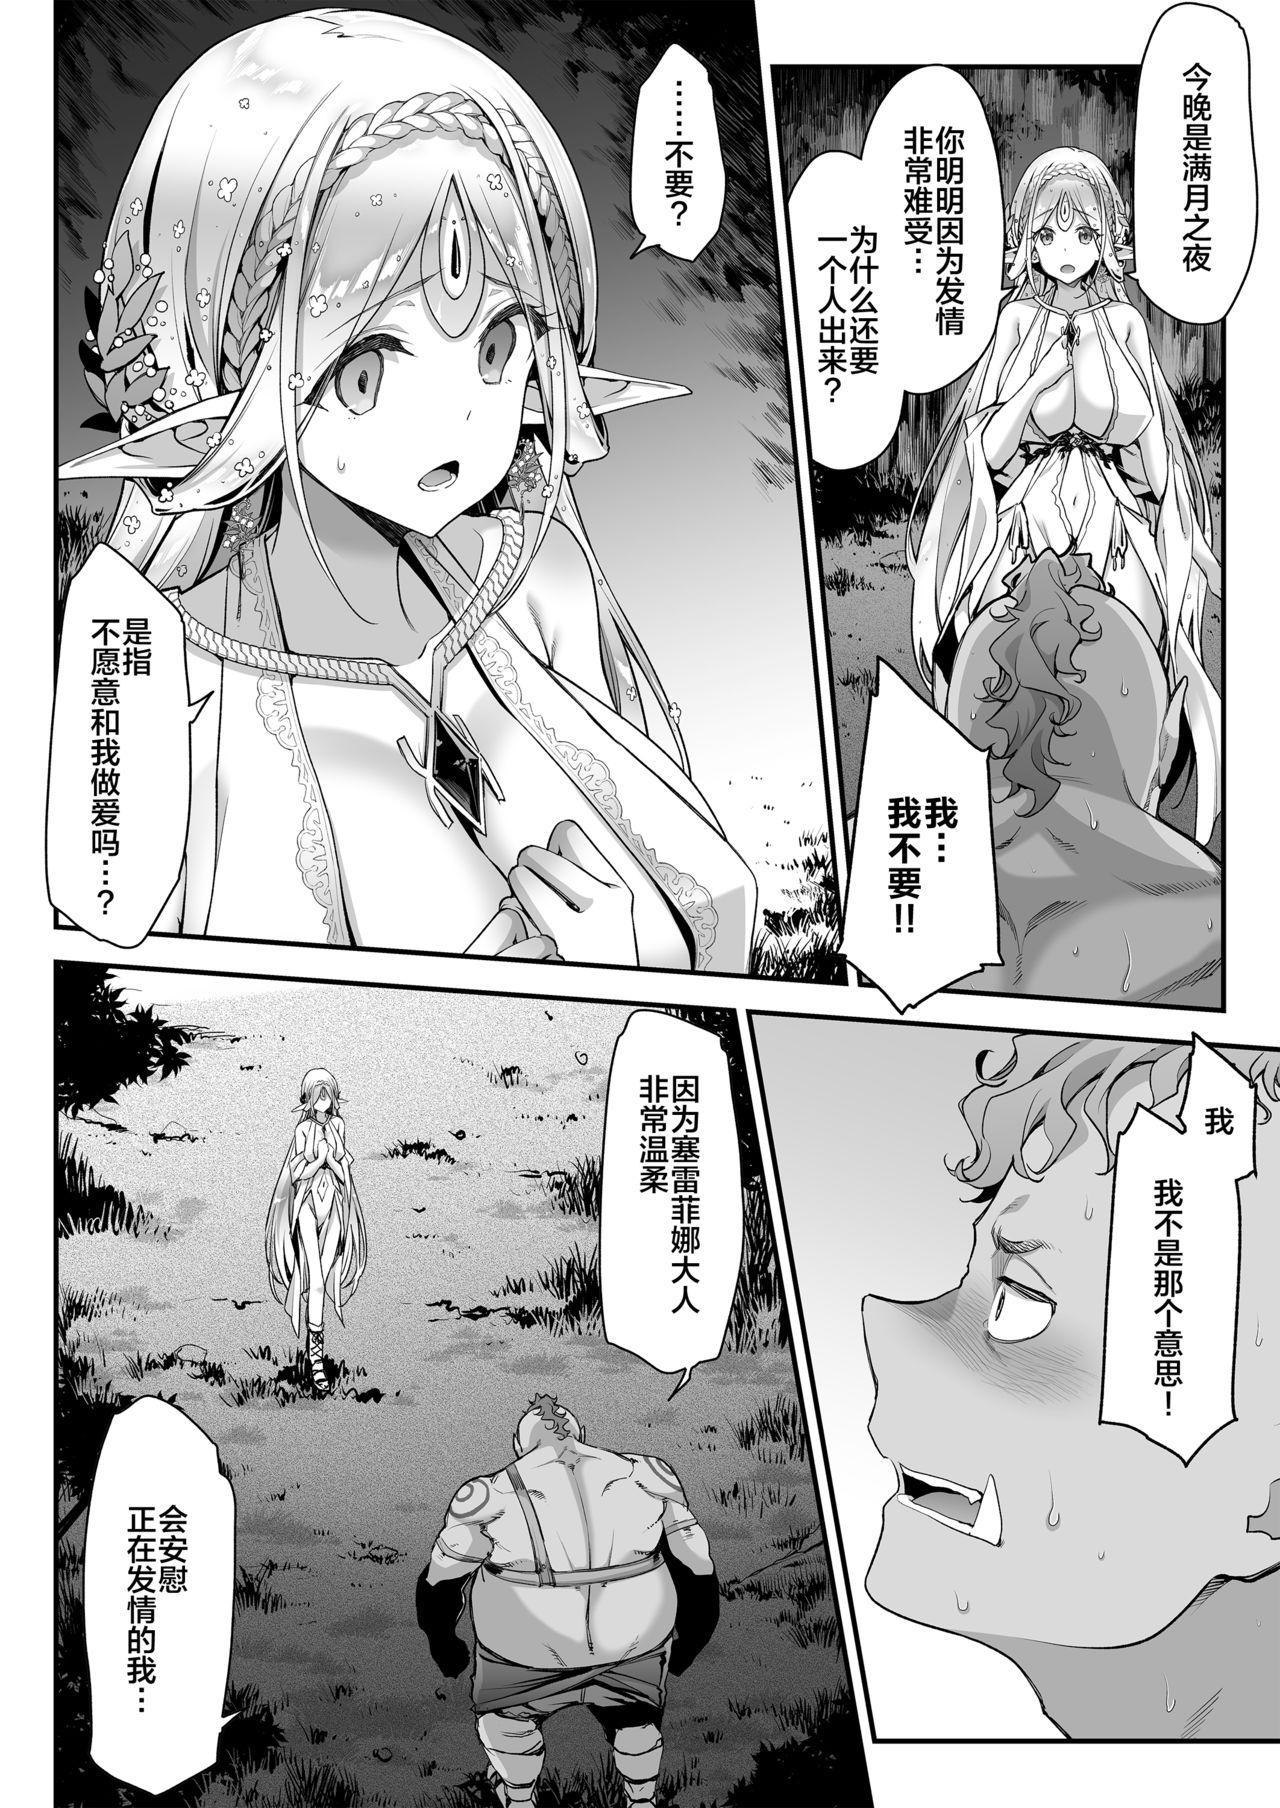 [Ichinose Land] Midara na Elf-san wa Orc-kun ga Osuki [Chinese] [新桥月白日语社] [Digital] 16